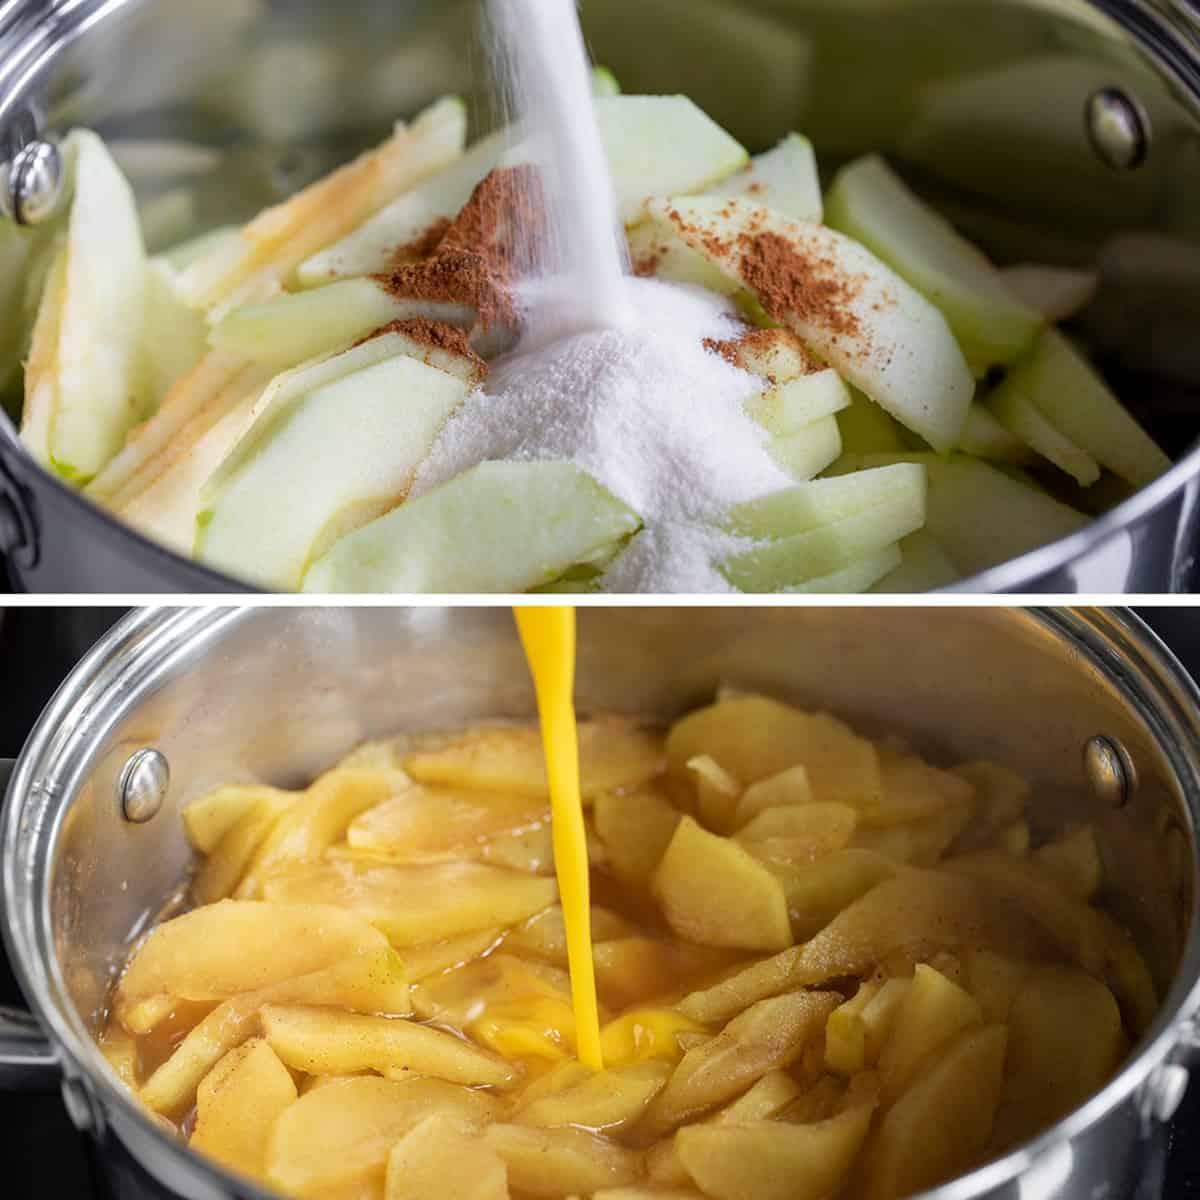 How to Make No Bake Apple Pie